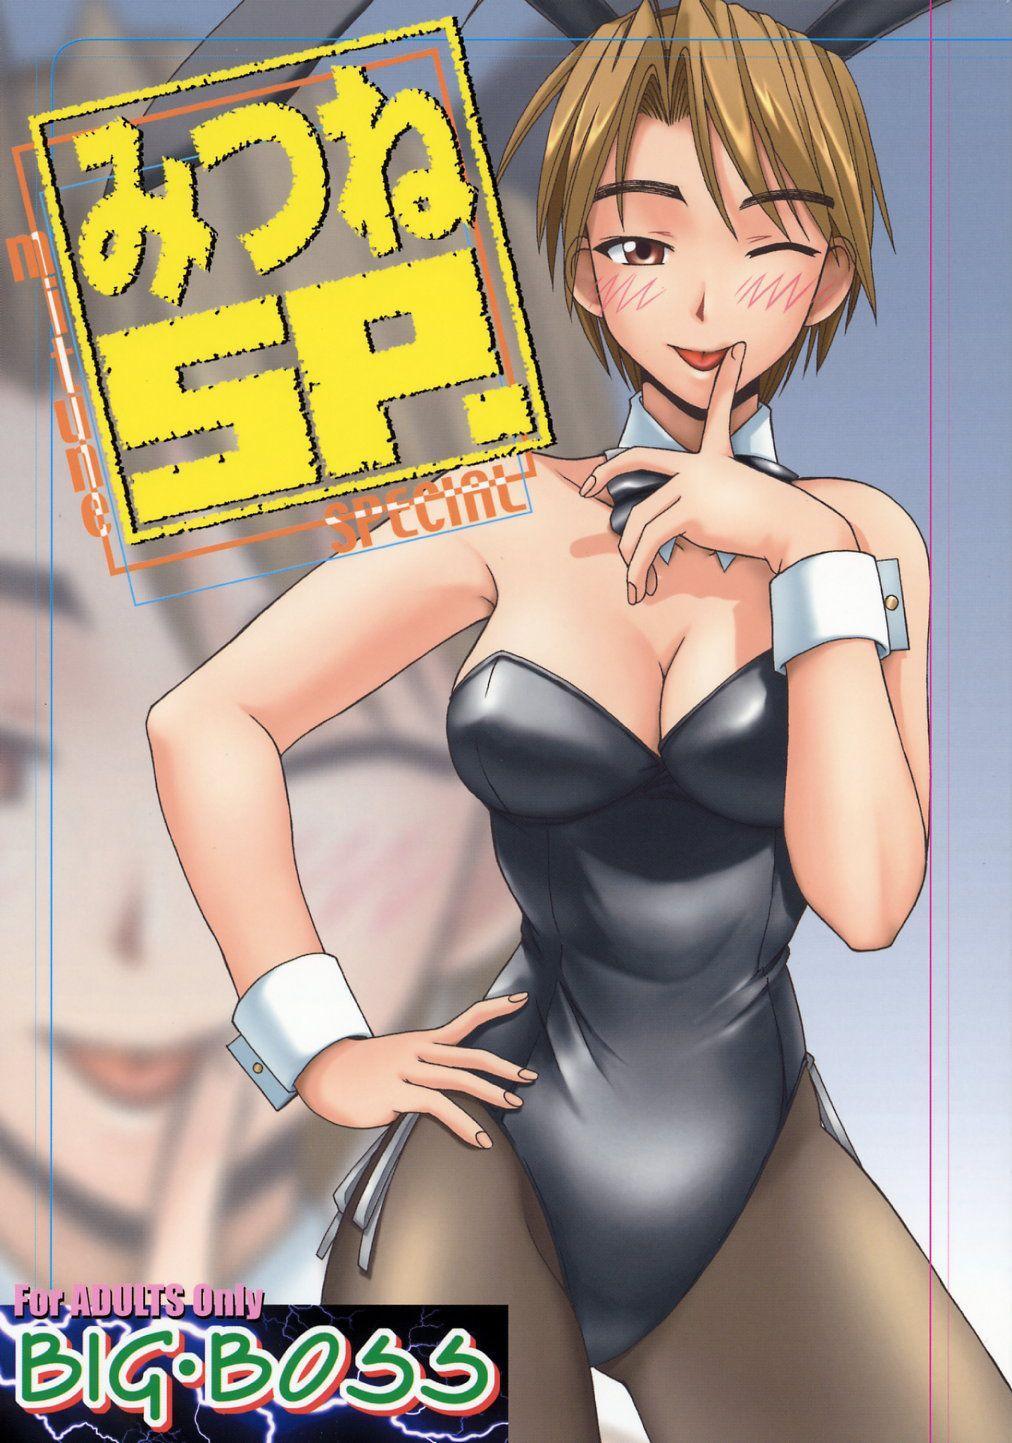 Mitsune SP 0